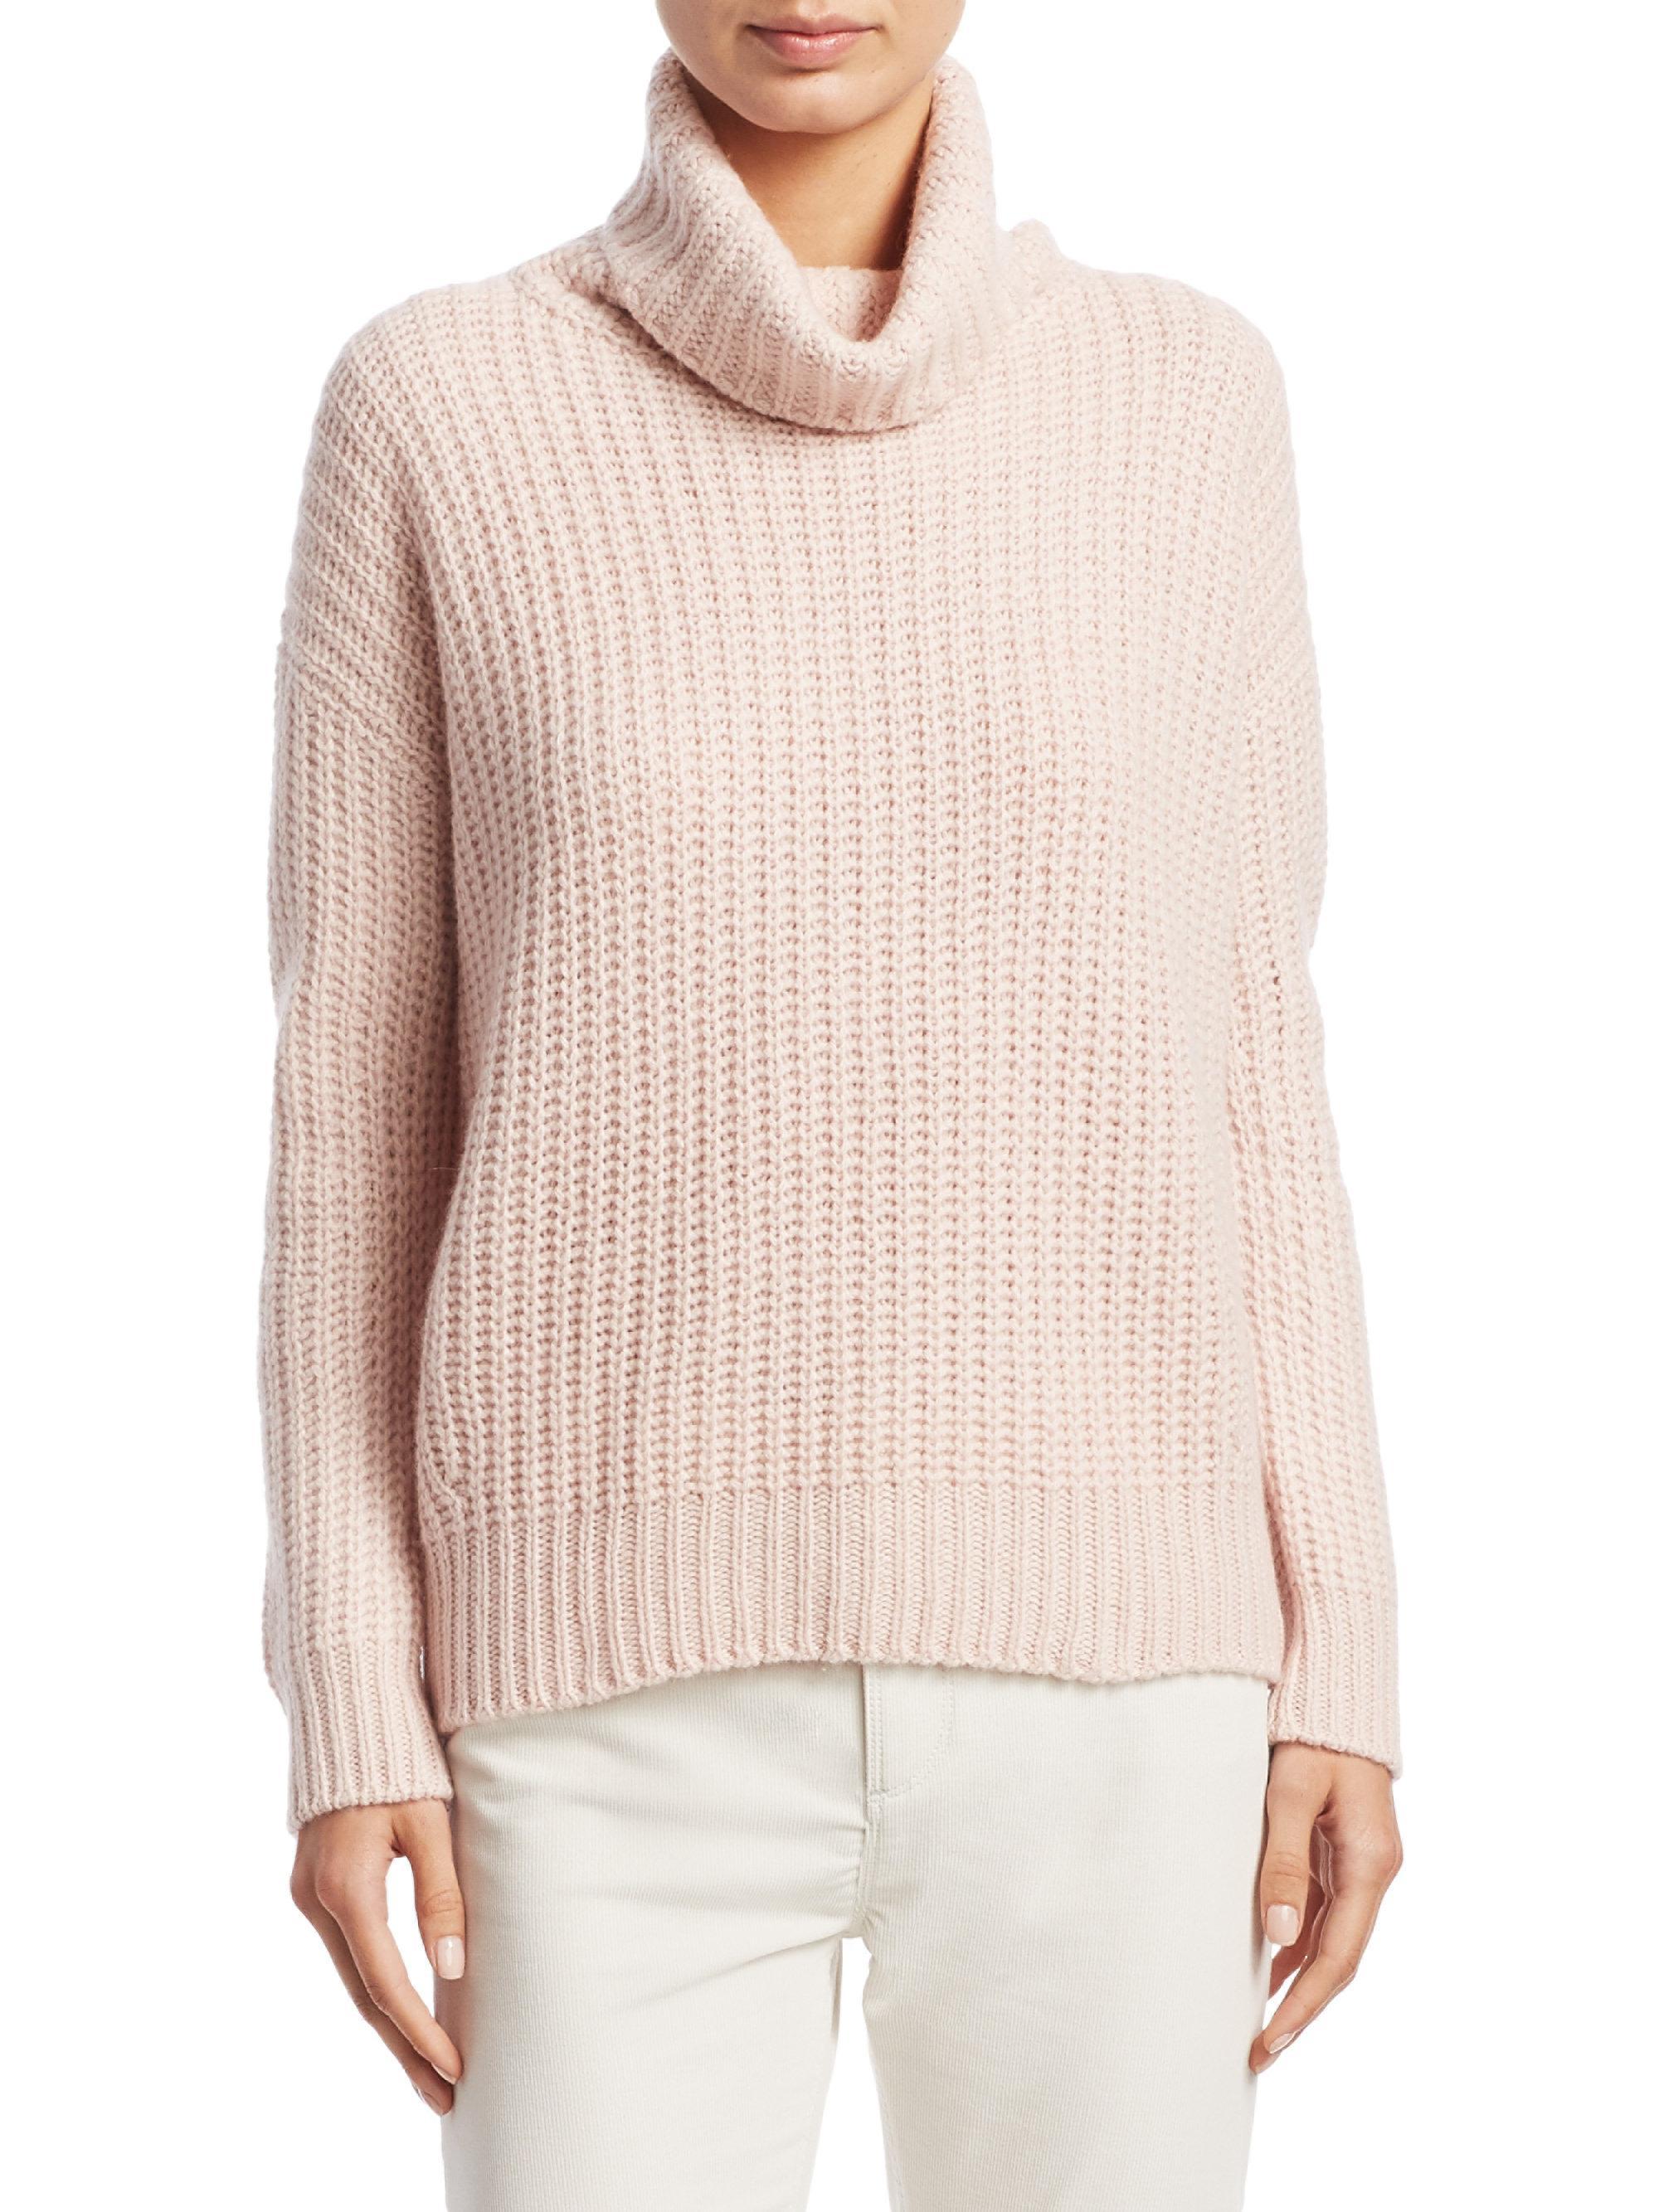 5aed31e40019 Lyst - Loro Piana Davenport Cashmere Turtleneck Sweater in Pink